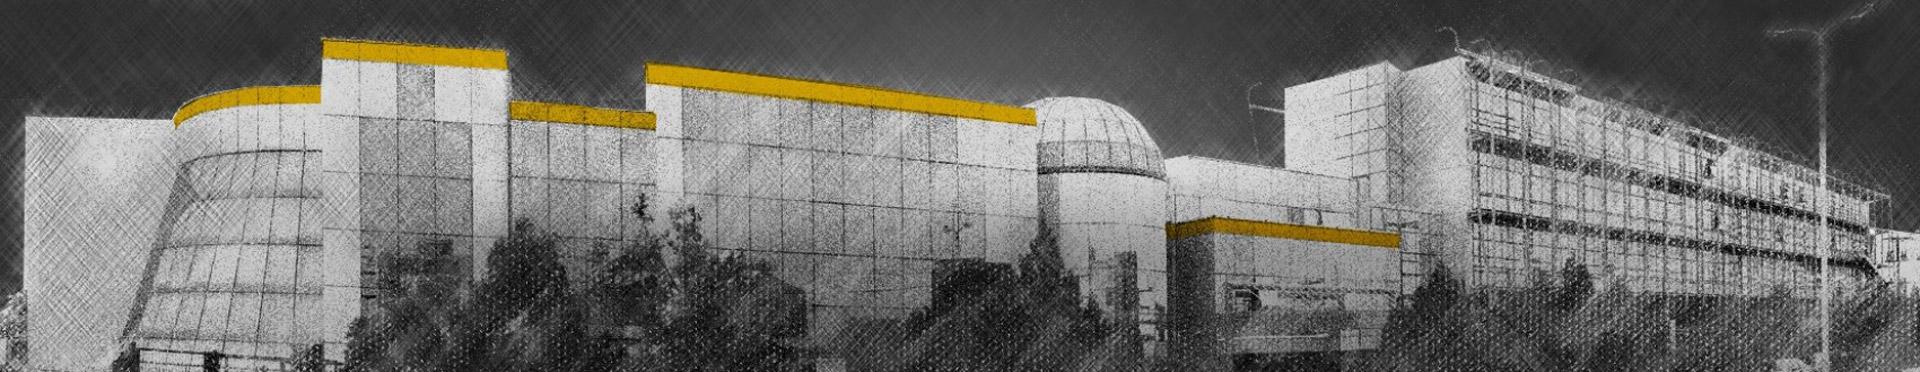 header-factory-yellow